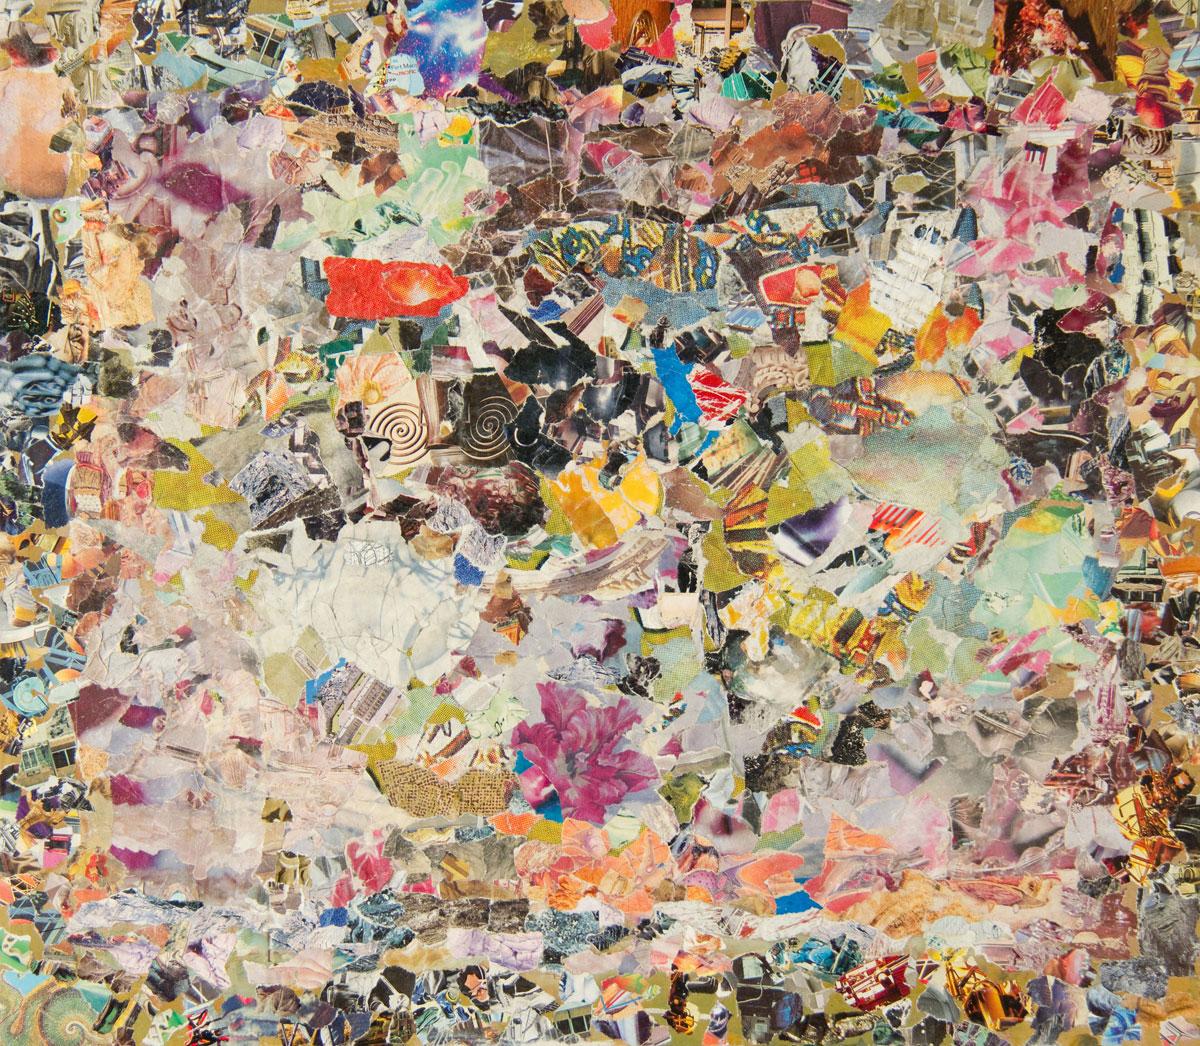 Philippe Briard - Fausse acalmie, 2011, collage, 41 x 47 cm